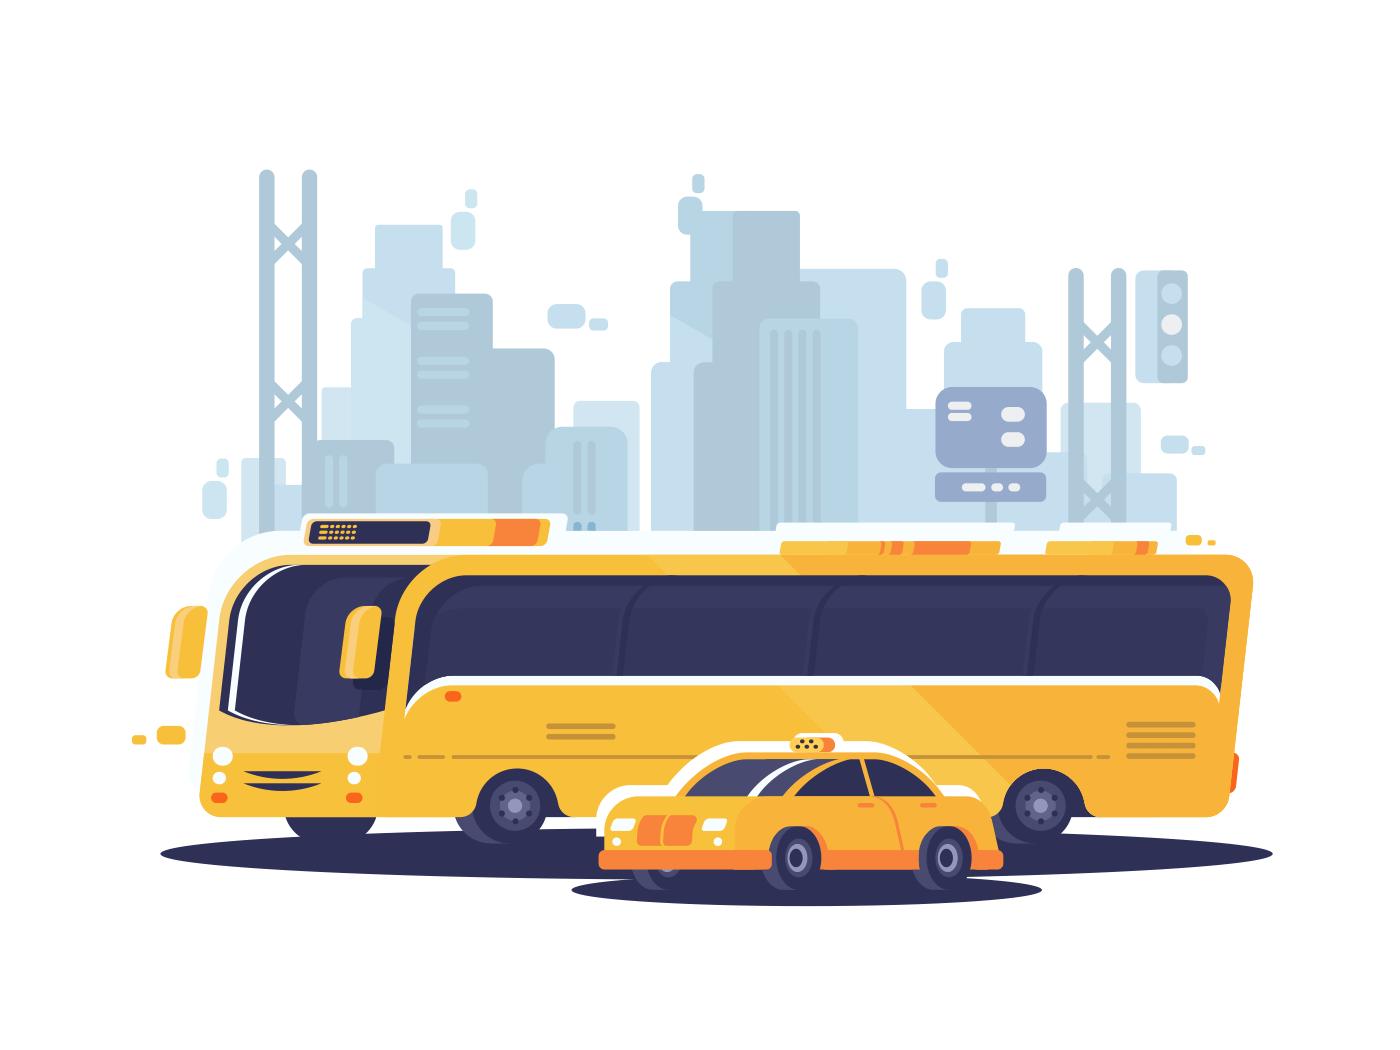 City public transport. Passenger bus and taxi car. Vector illustration